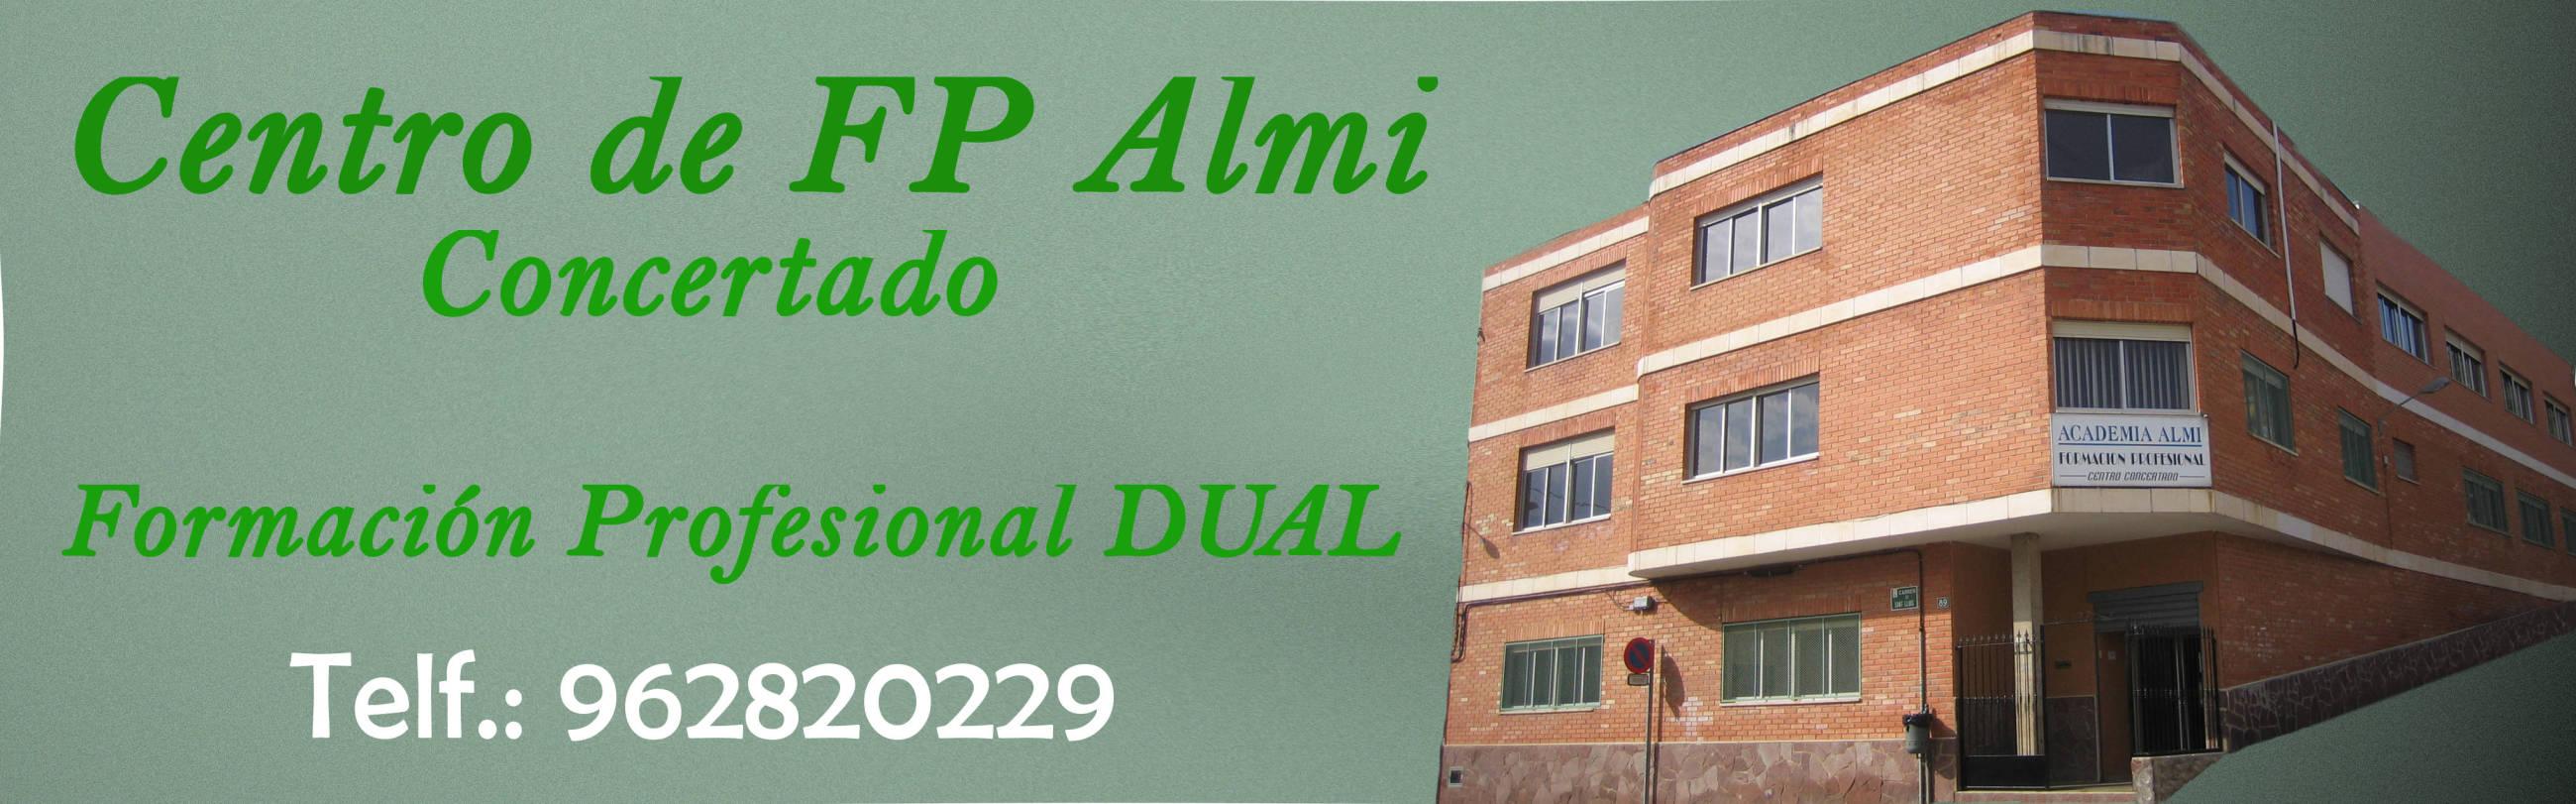 Bienvenido a centro de formaci n profesional almi for On centro de formacion